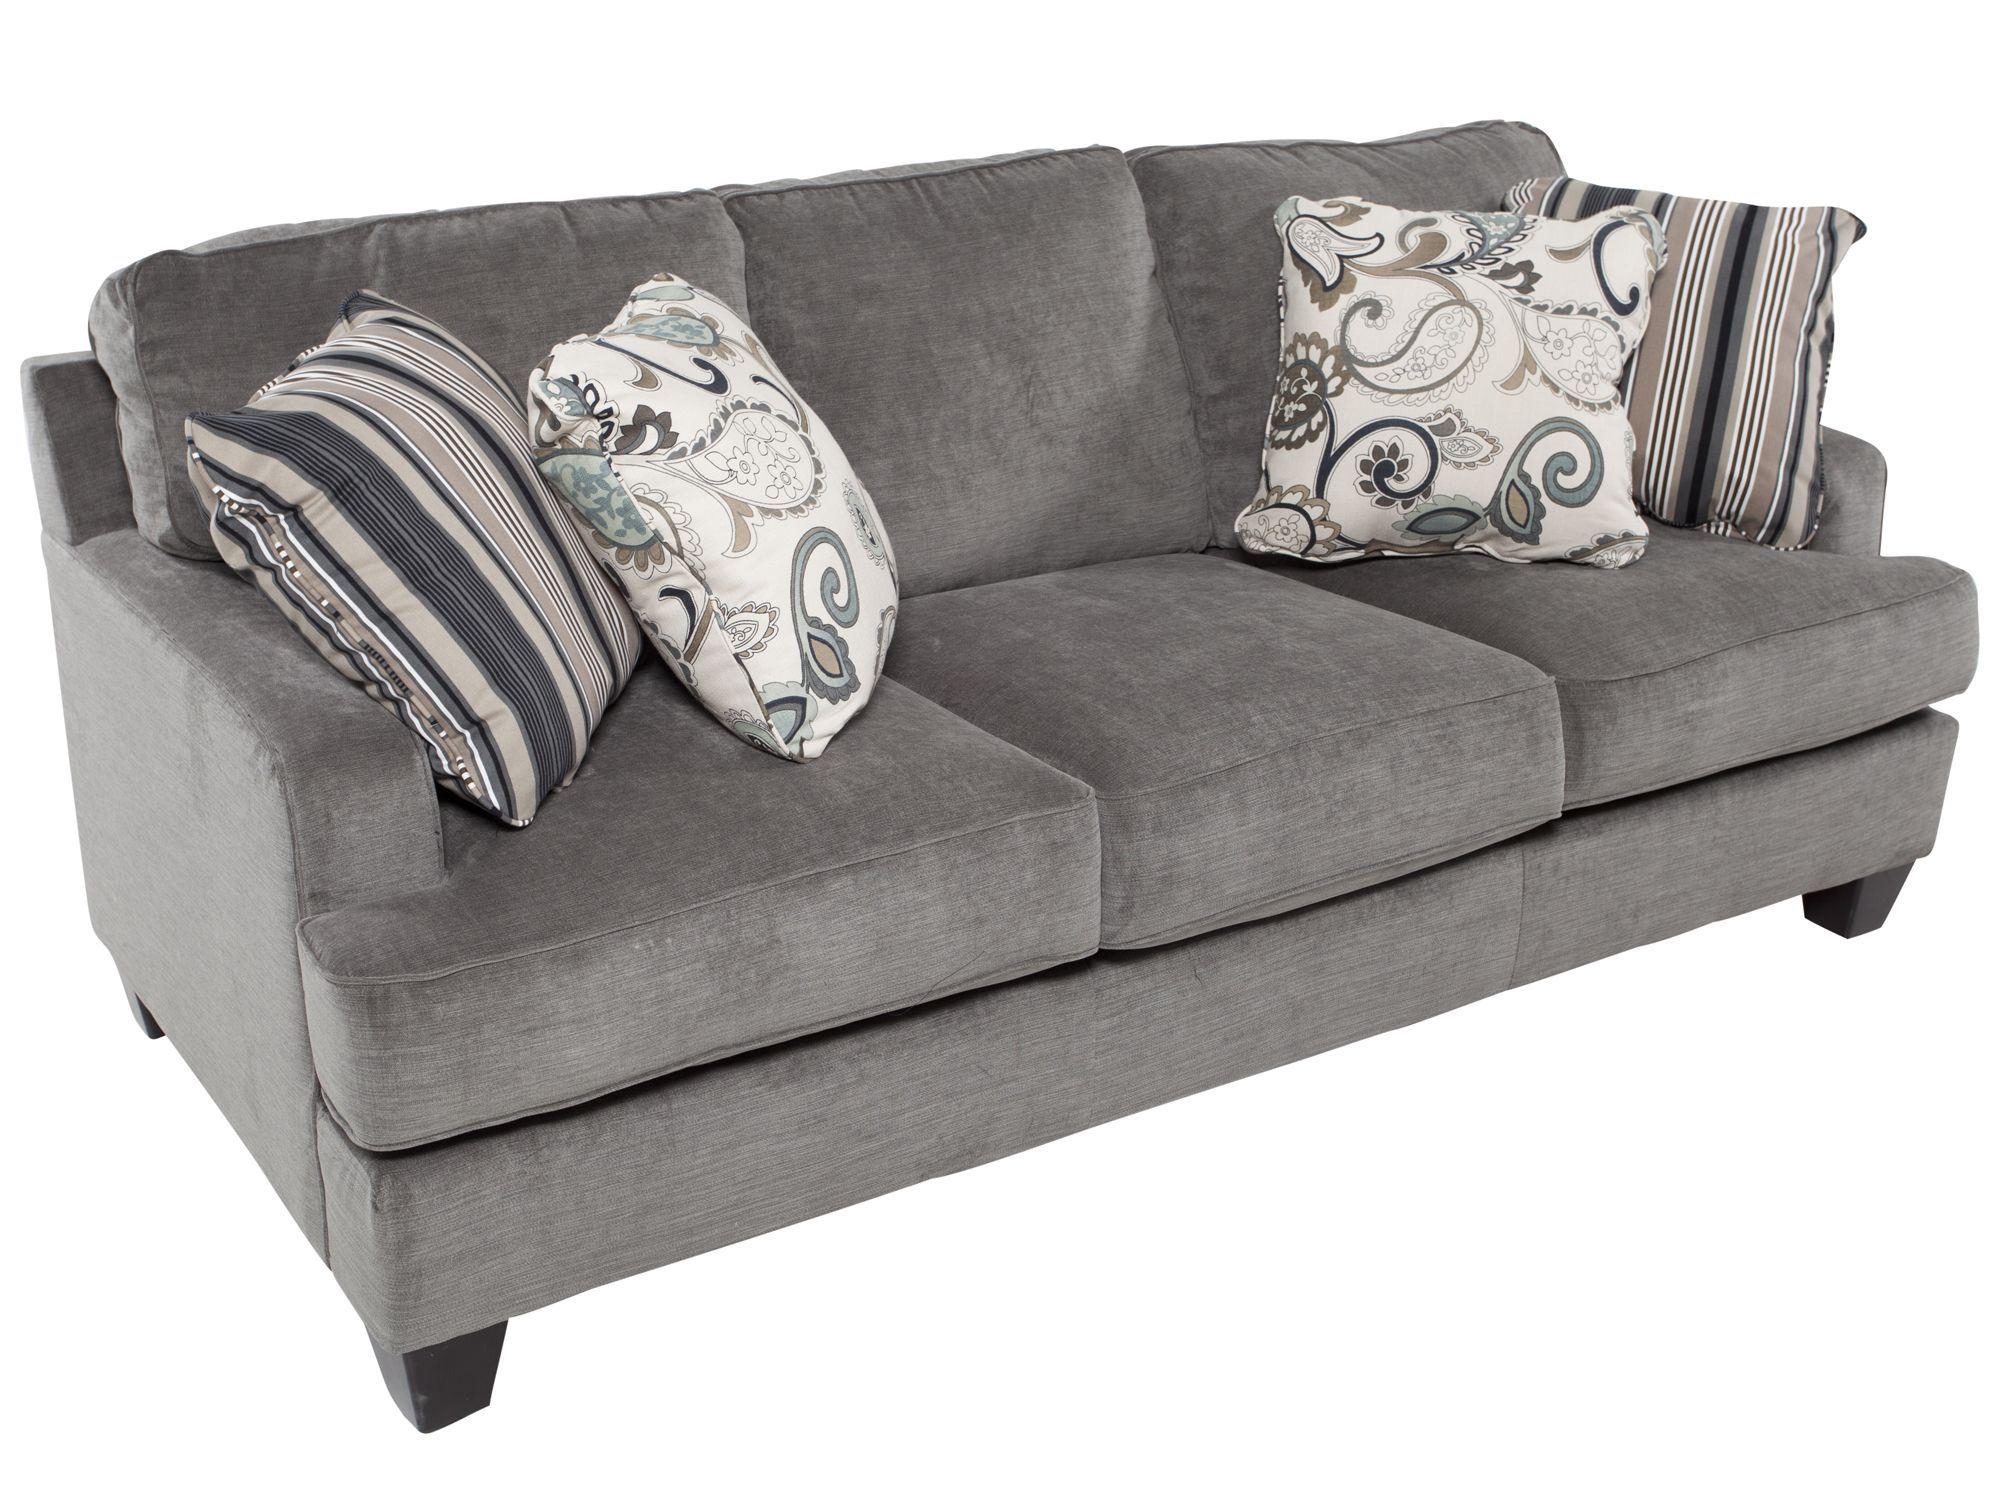 Sofa yes pillows no Ashley Furniture Entice Mist sofa $500